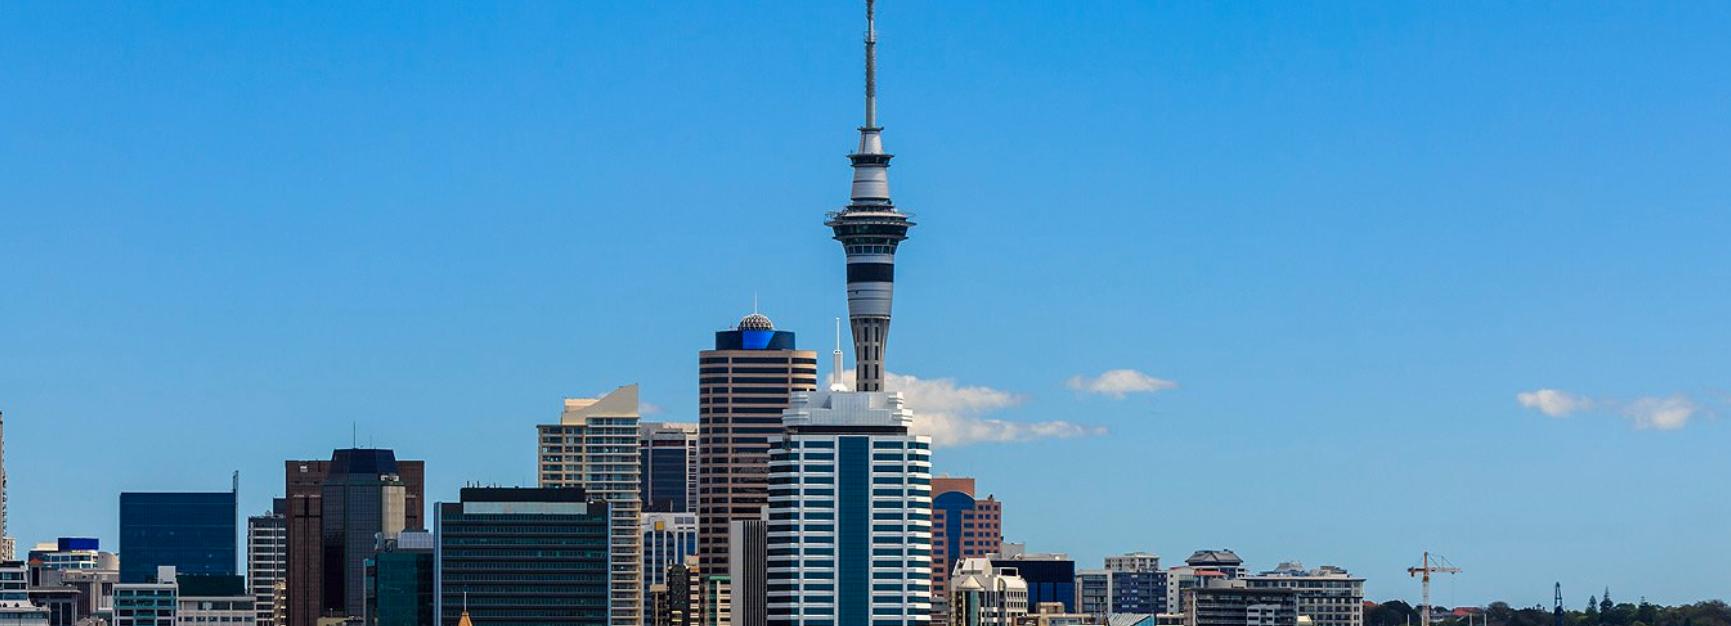 Zippi - Auckland